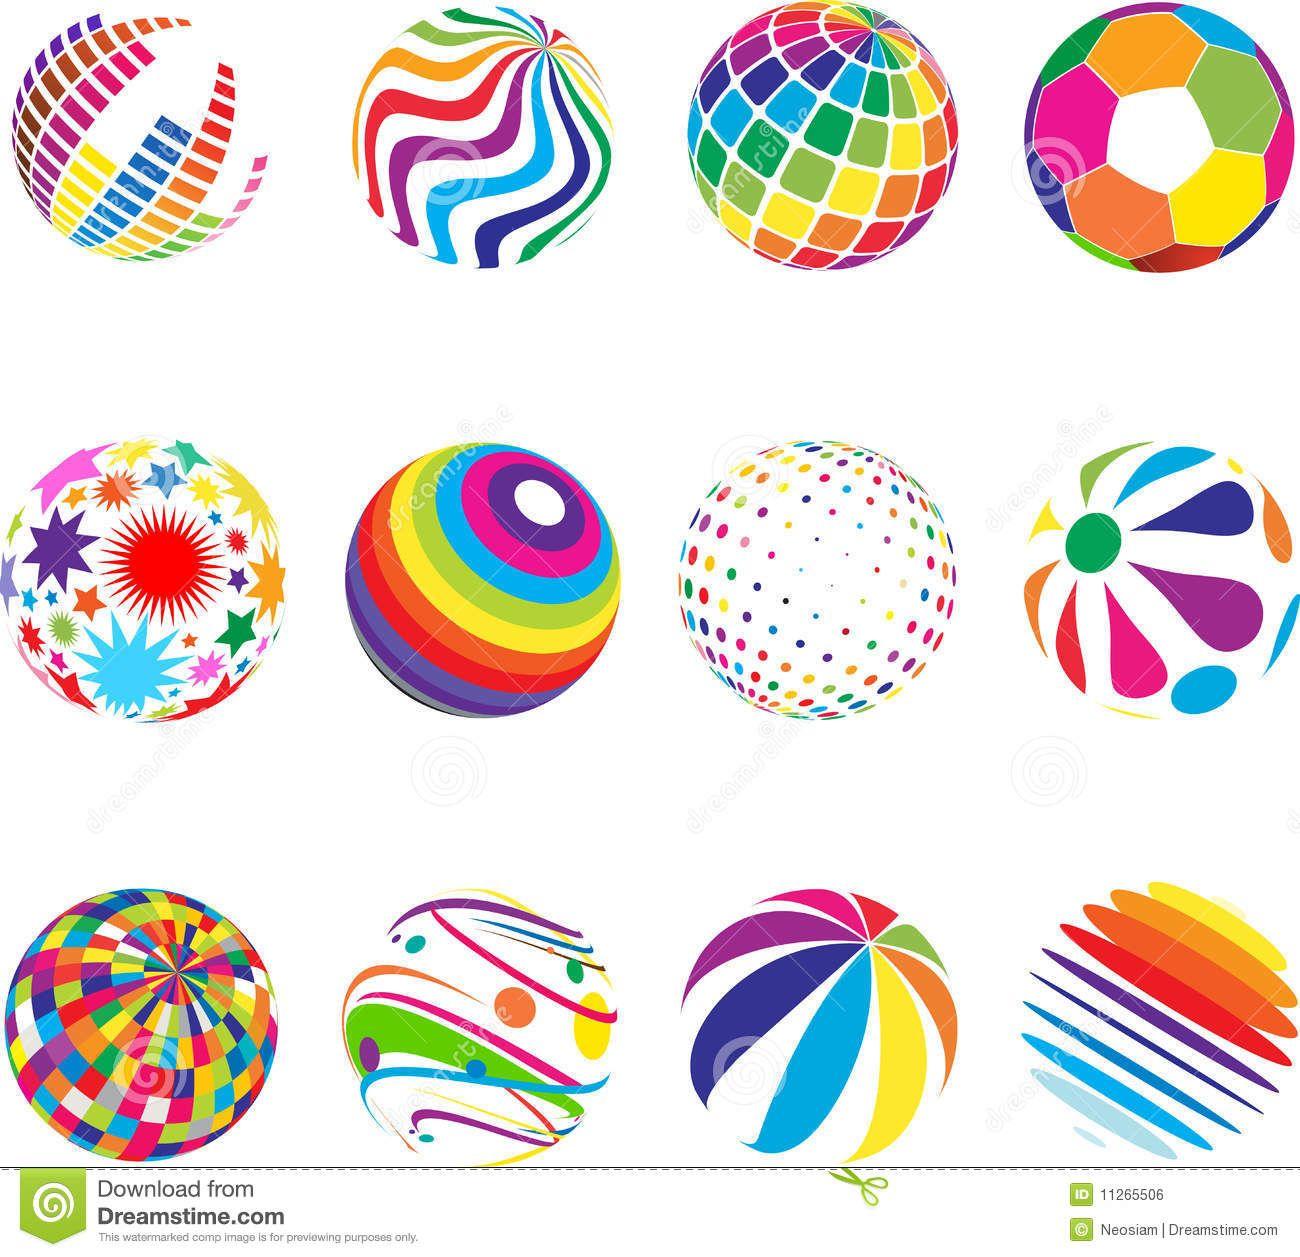 logos. logo designs Pinterest